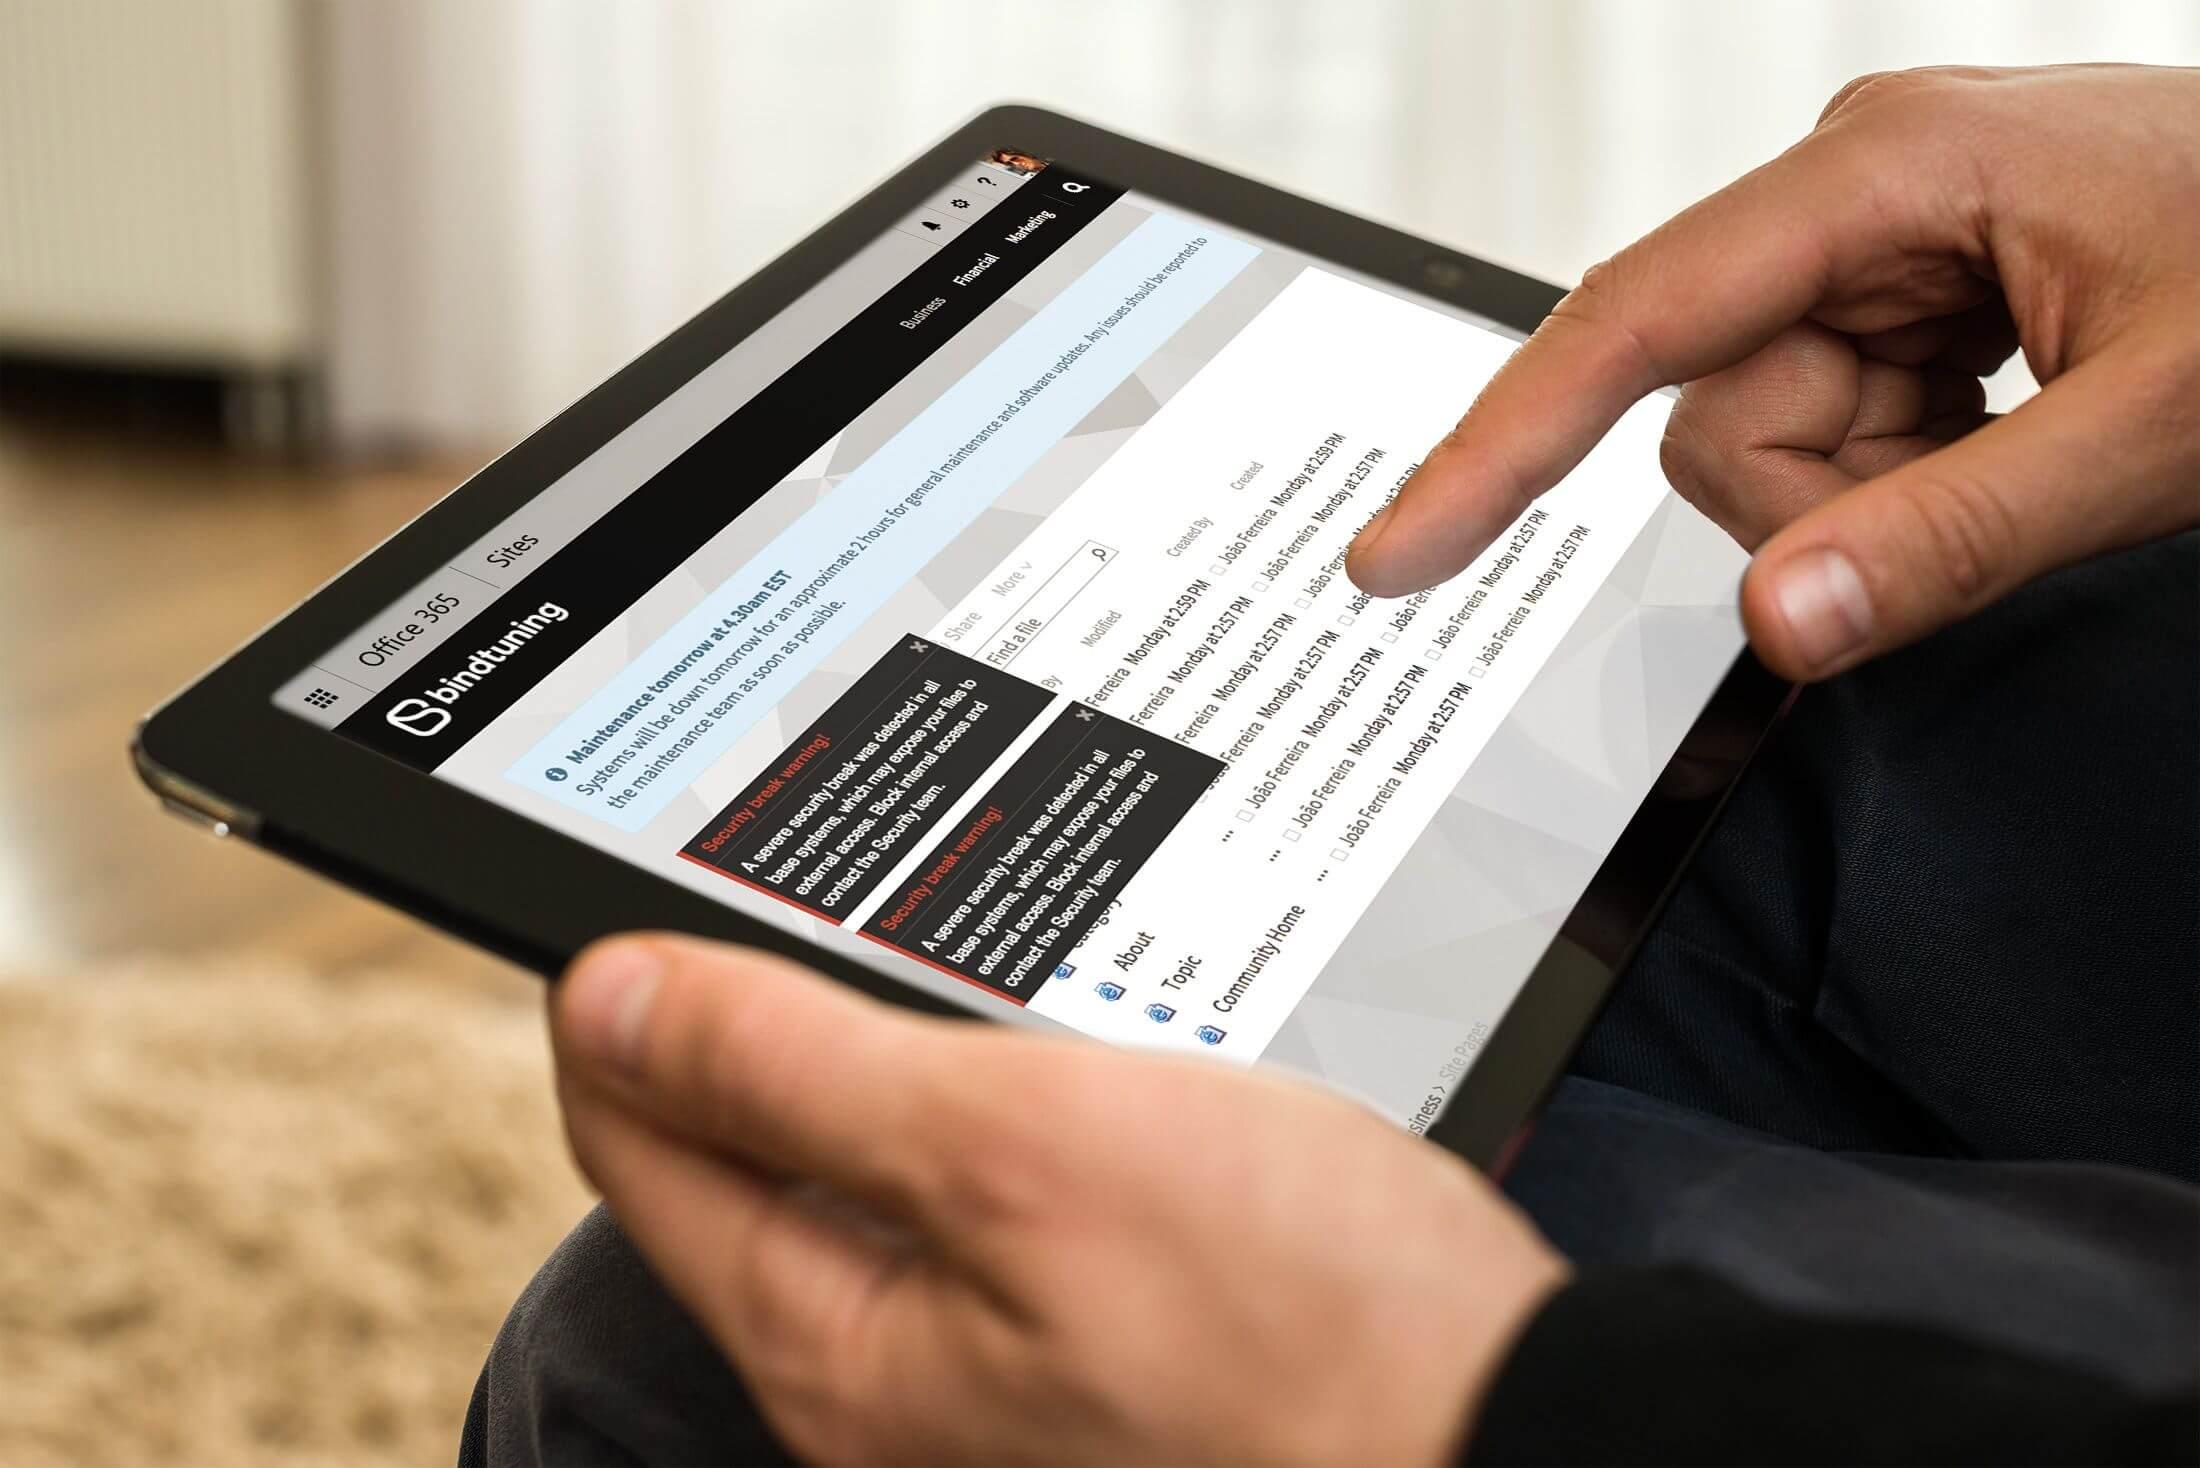 sharepoint alerts web part